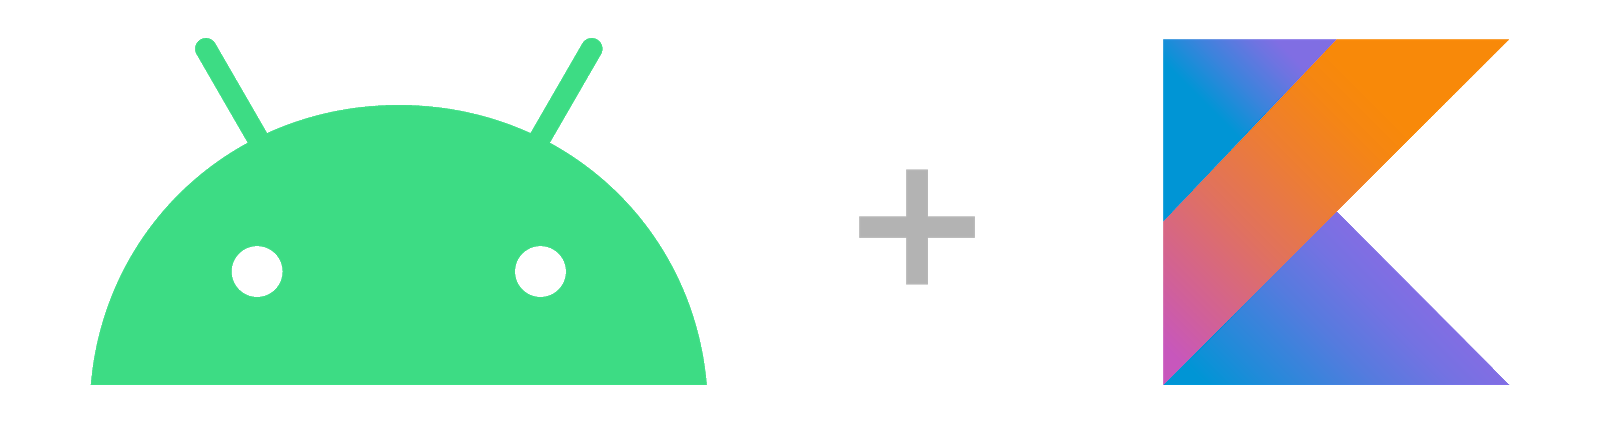 Android と Kotlin のロゴ